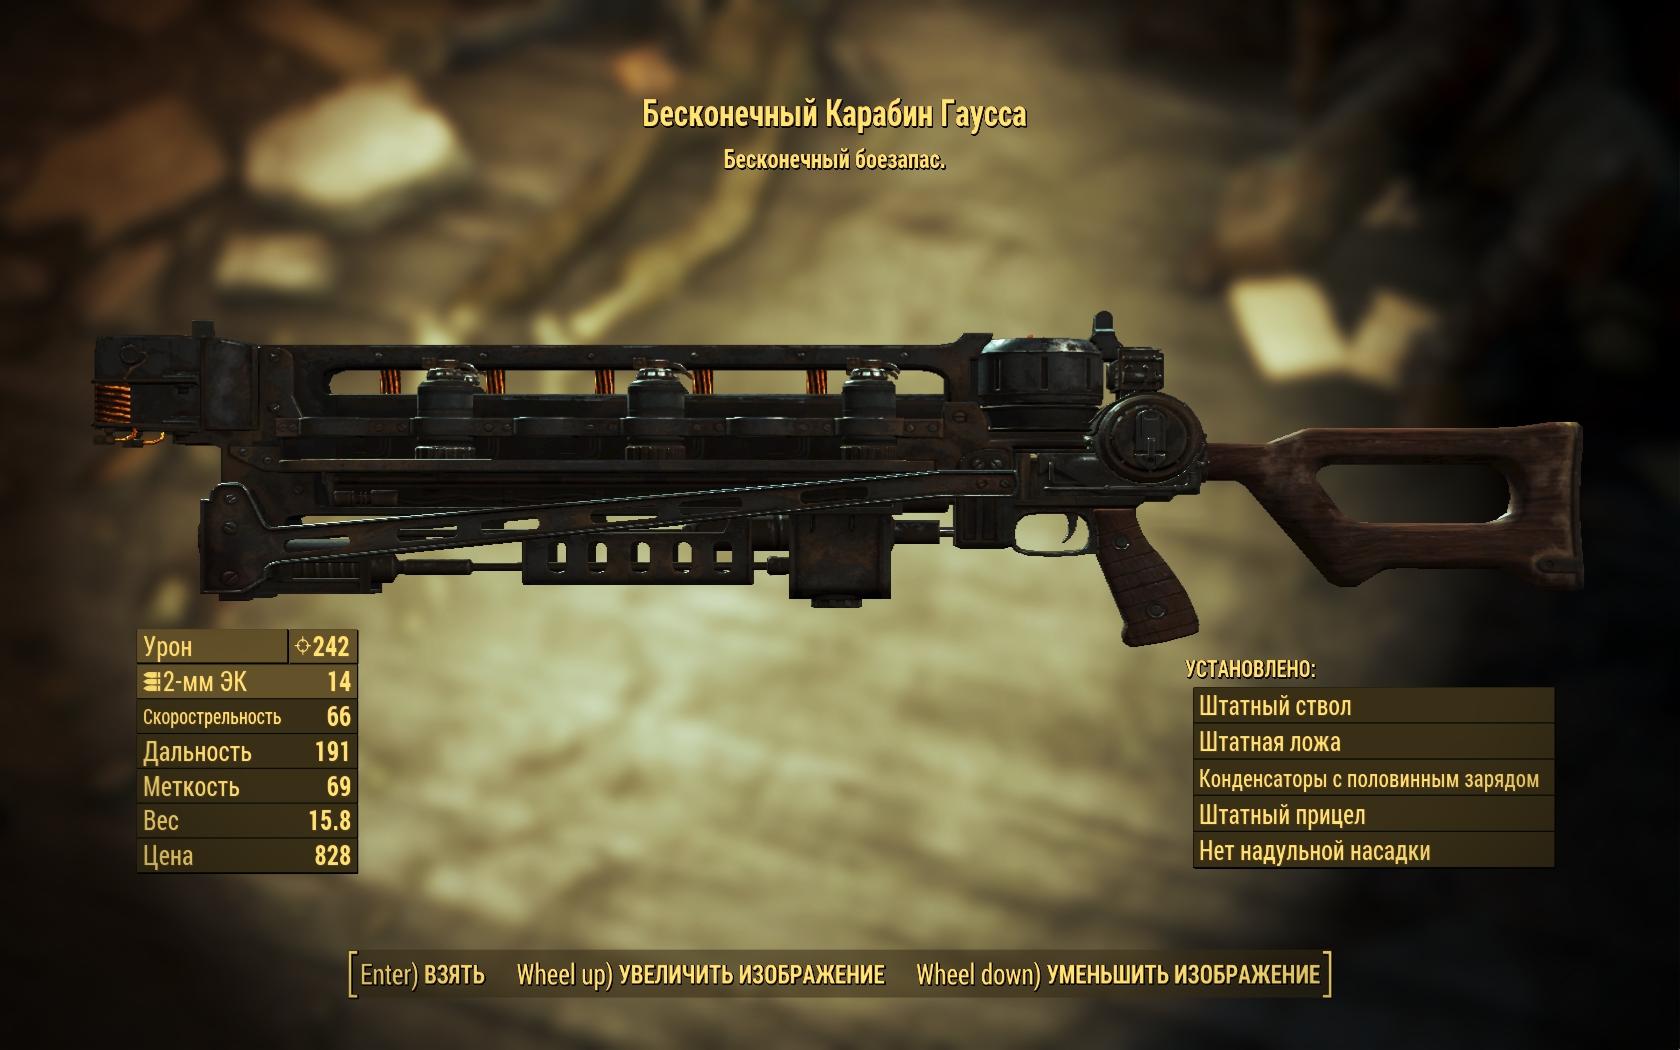 карабин - Fallout 4 Гаусс, Оружие